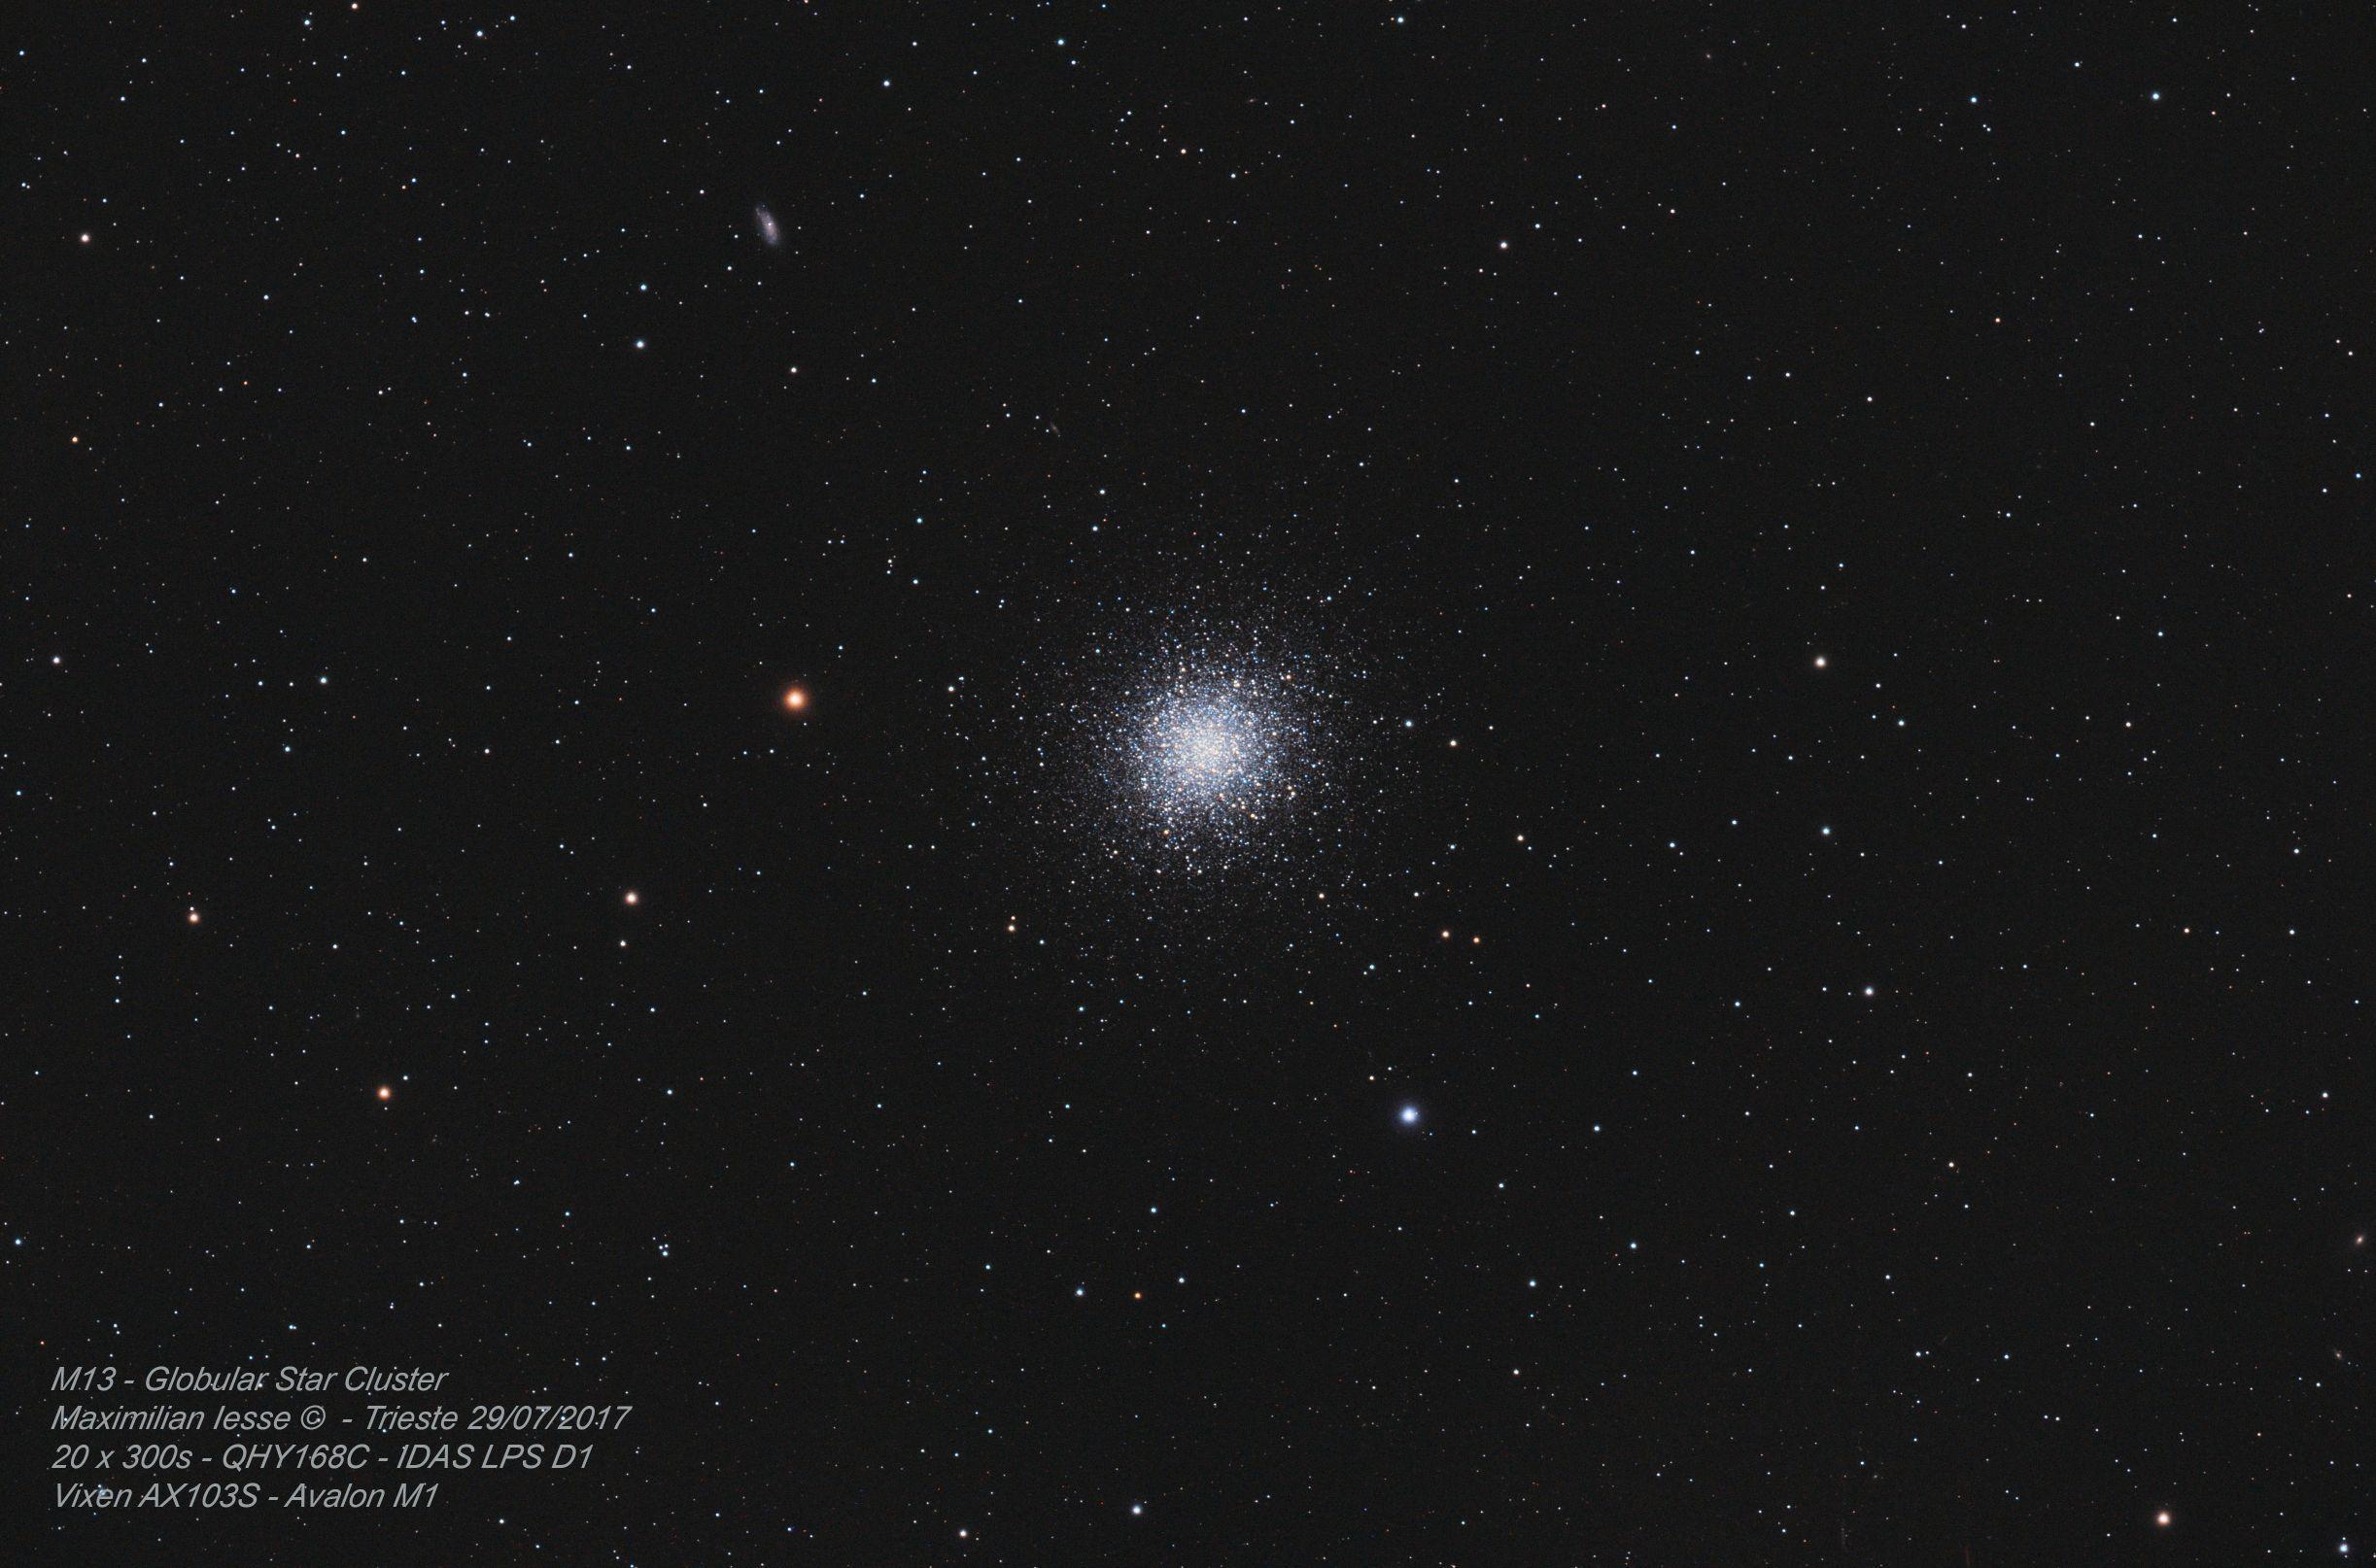 M13 - AX103S - Iesse M.